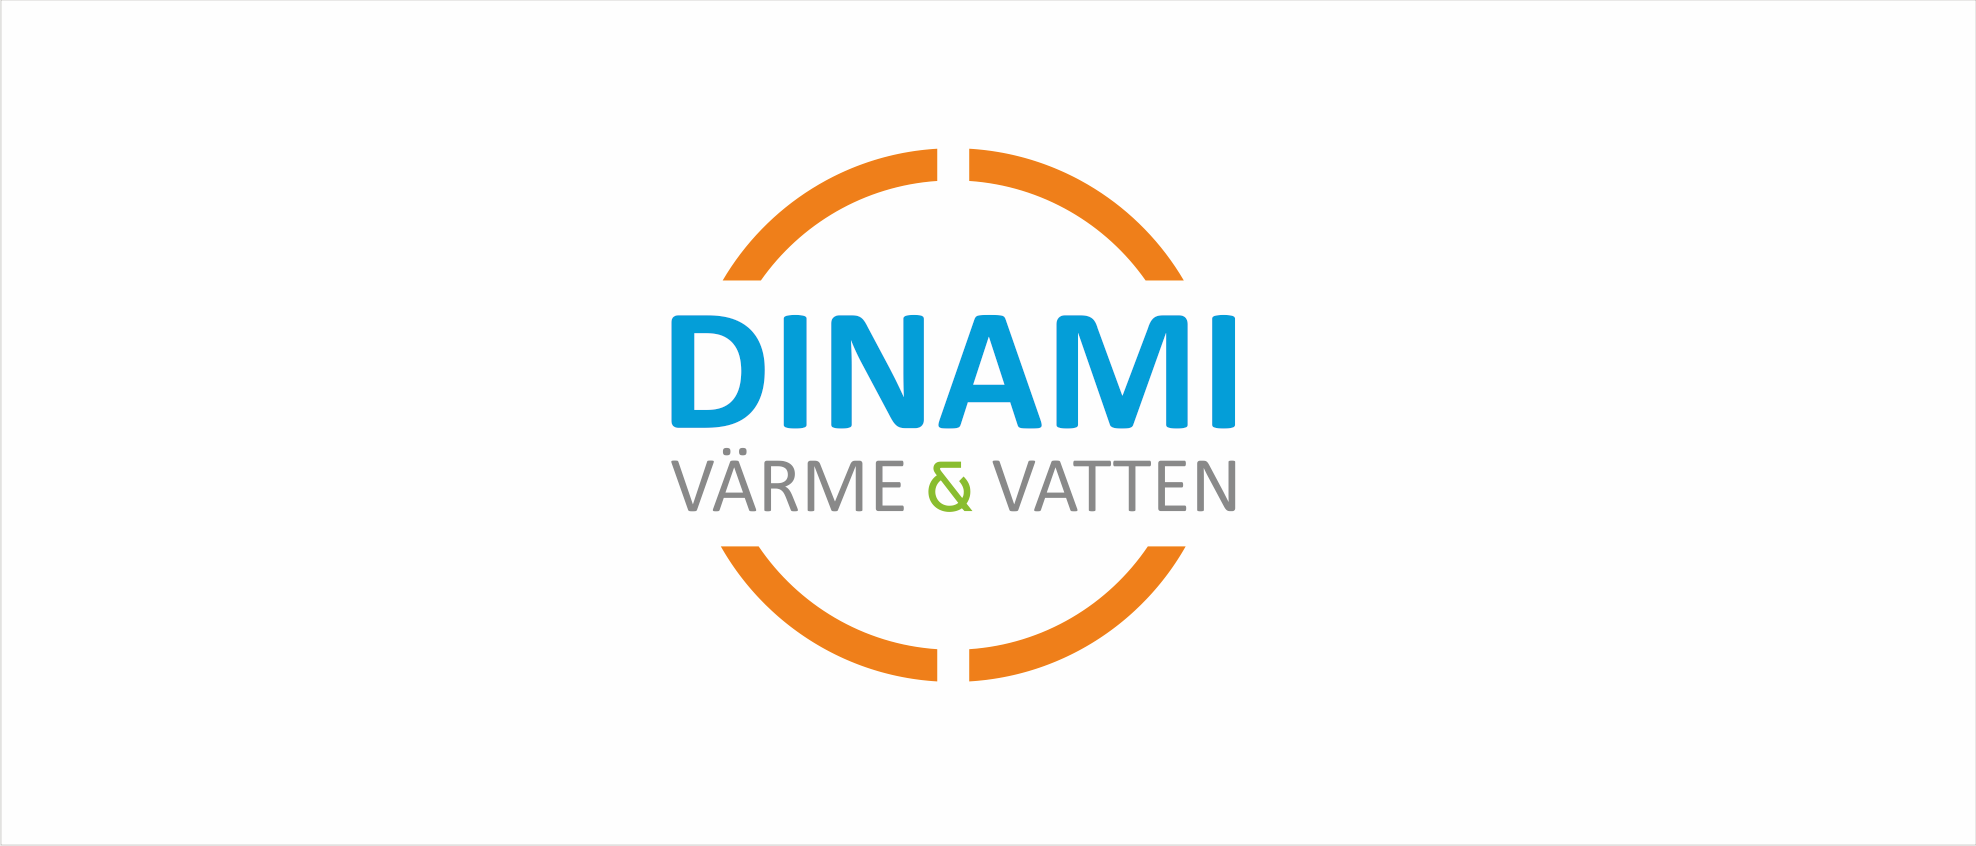 Dinami-logo-webb mob_01